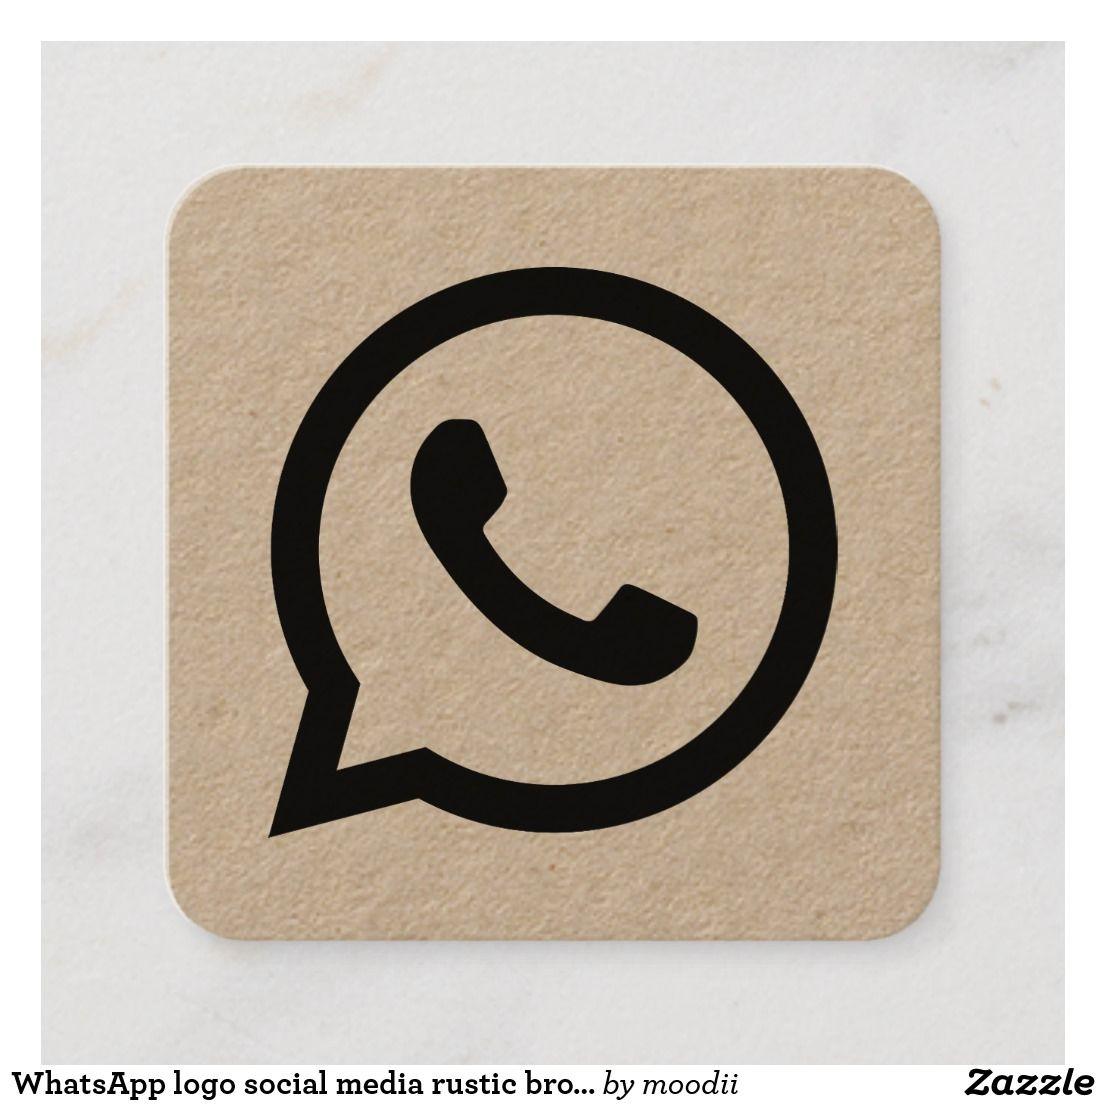 Whatsapp Logo Social Media Rustic Brown Kraft Calling Card Zazzle Com In 2020 Iphone Wallpaper Vintage Aesthetic Iphone Wallpaper Flower Phone Wallpaper